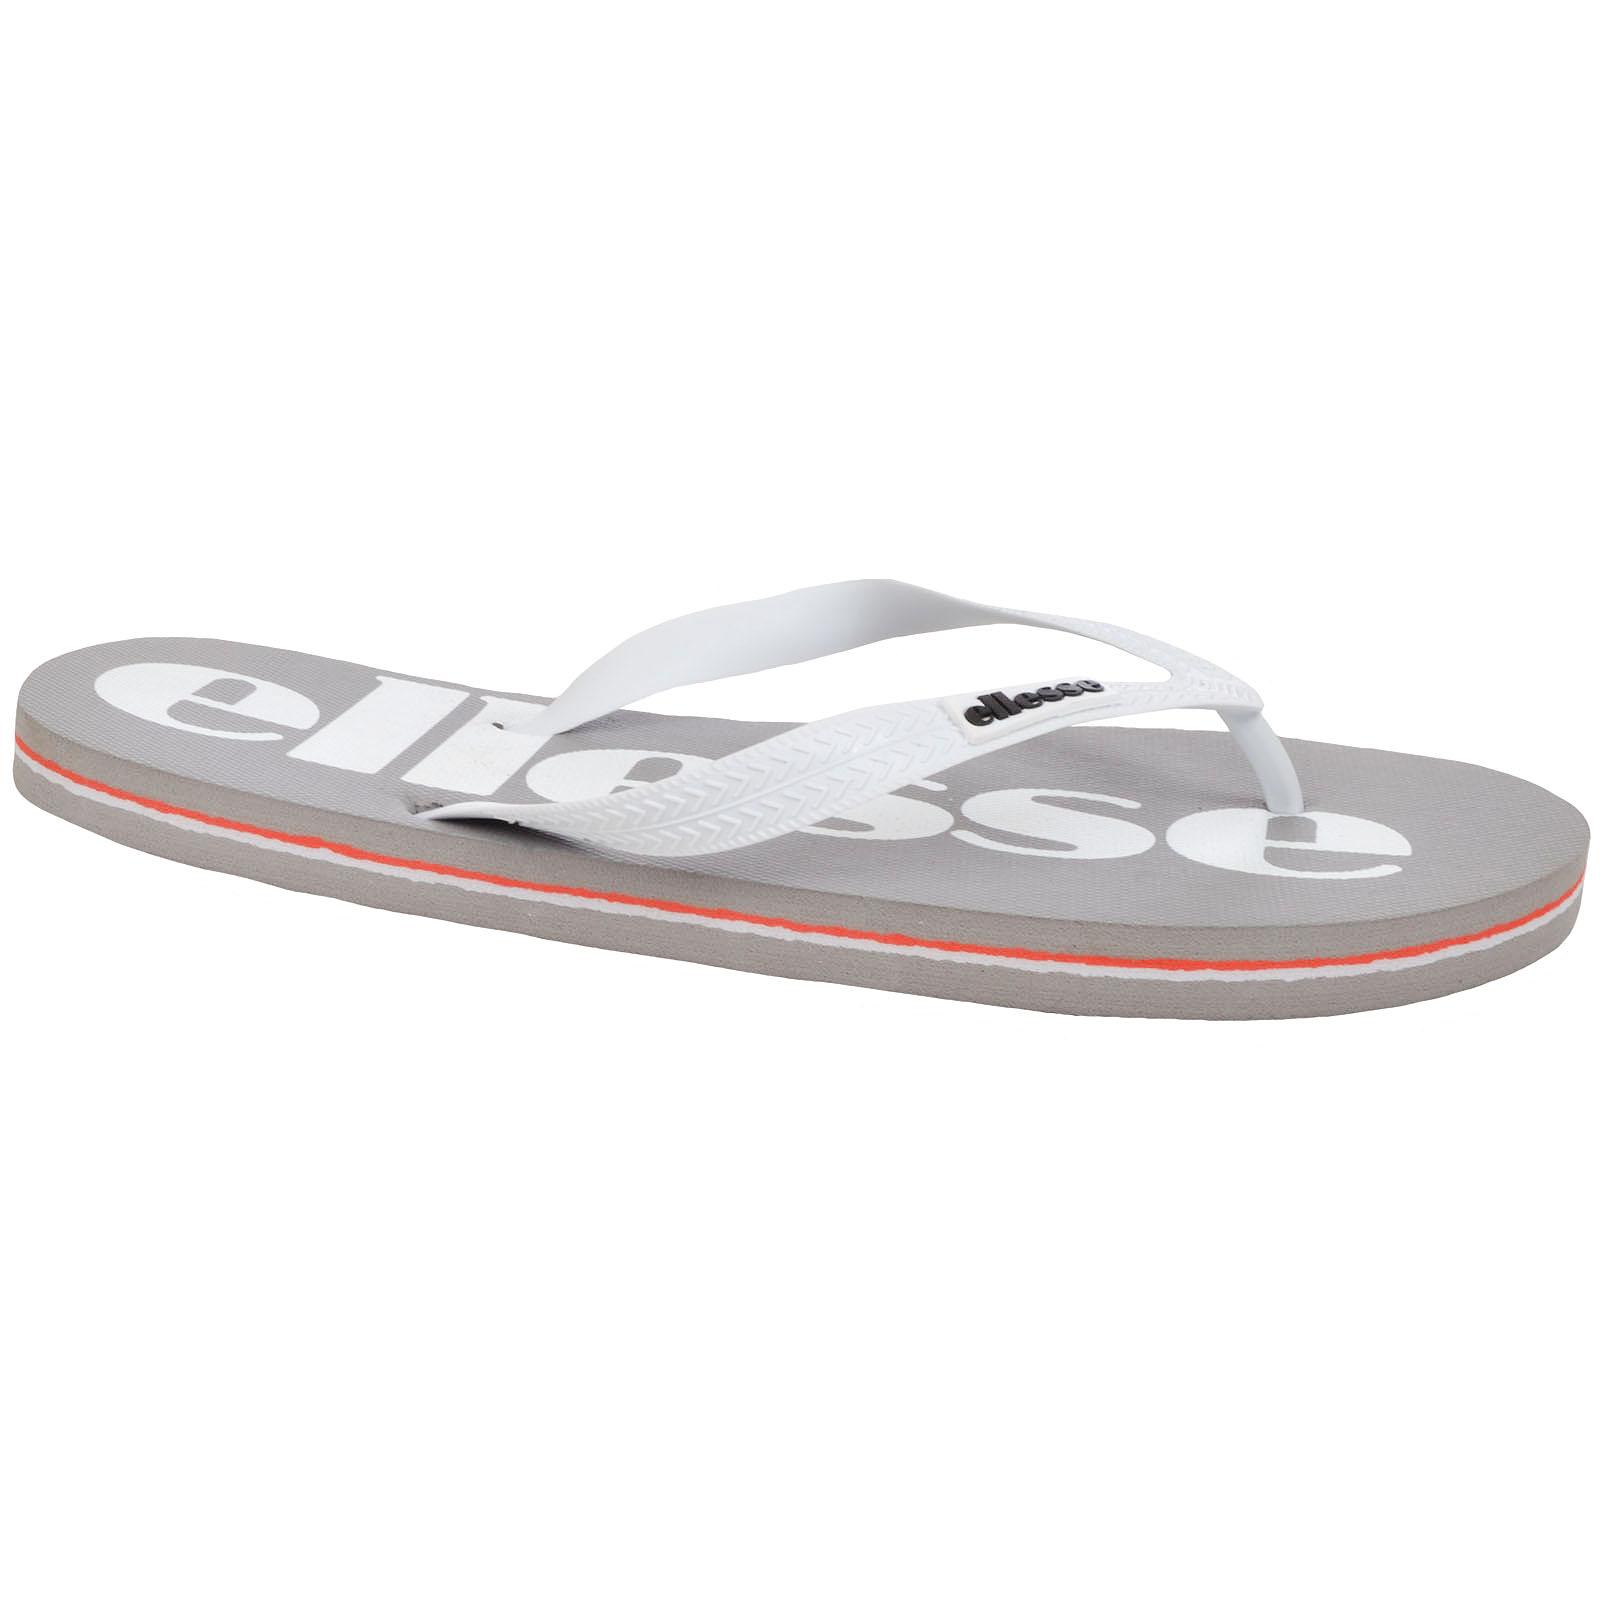 Ellesse-Mens-Marcos-Flip-Flops-Beach-Pool-Holiday-Slip-On-Sandals-Thongs thumbnail 11